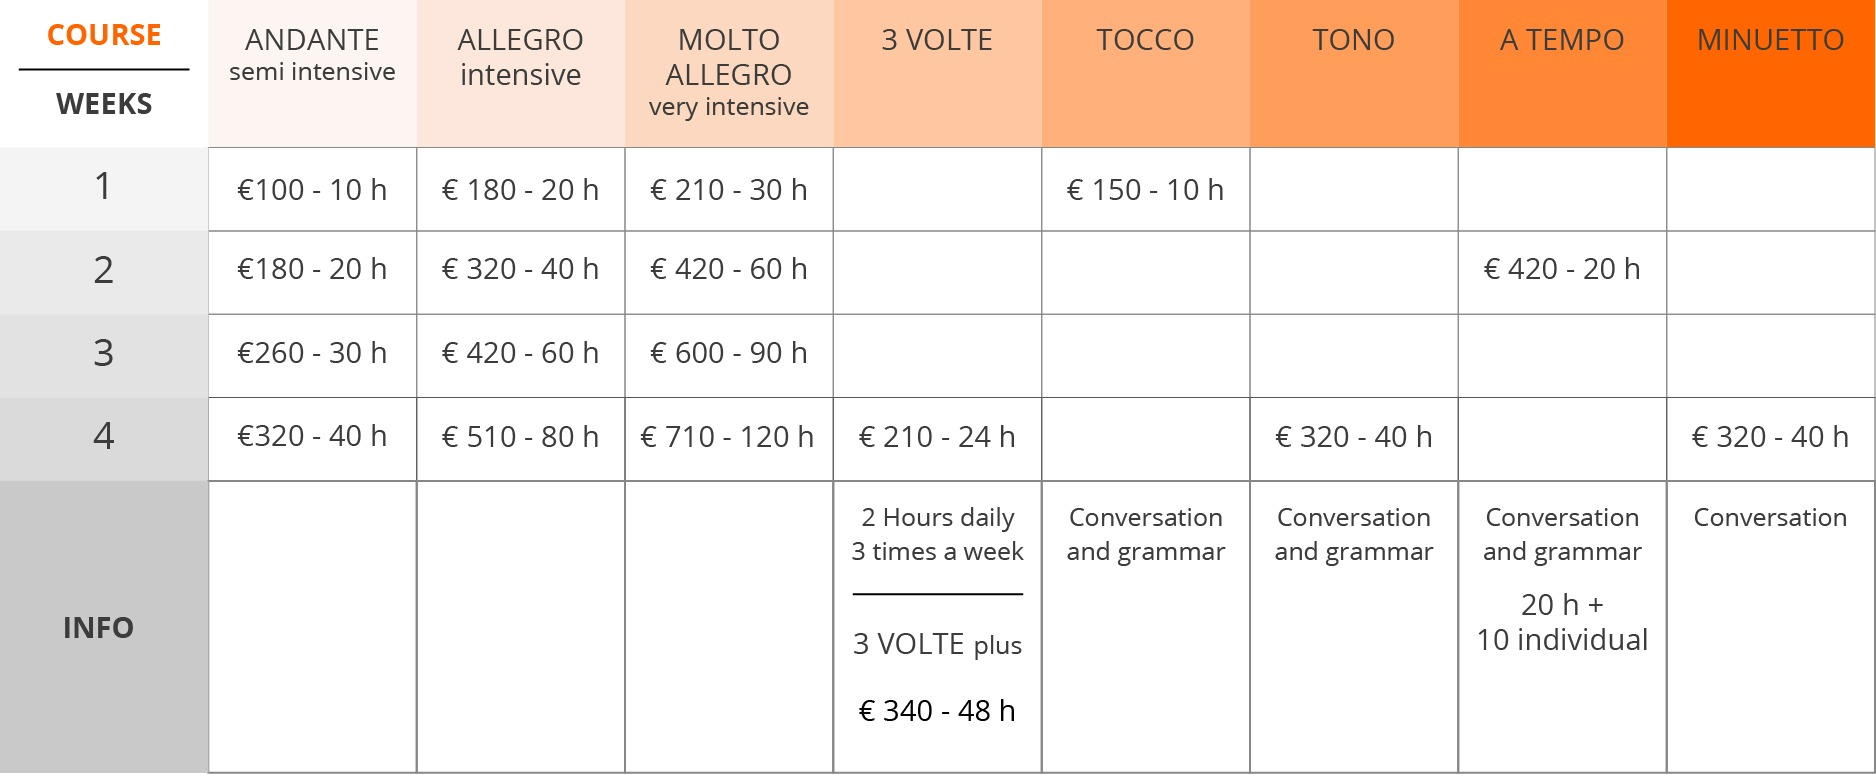 tabella prezzi parola1 01 - ITALYANCA KURSLARİ